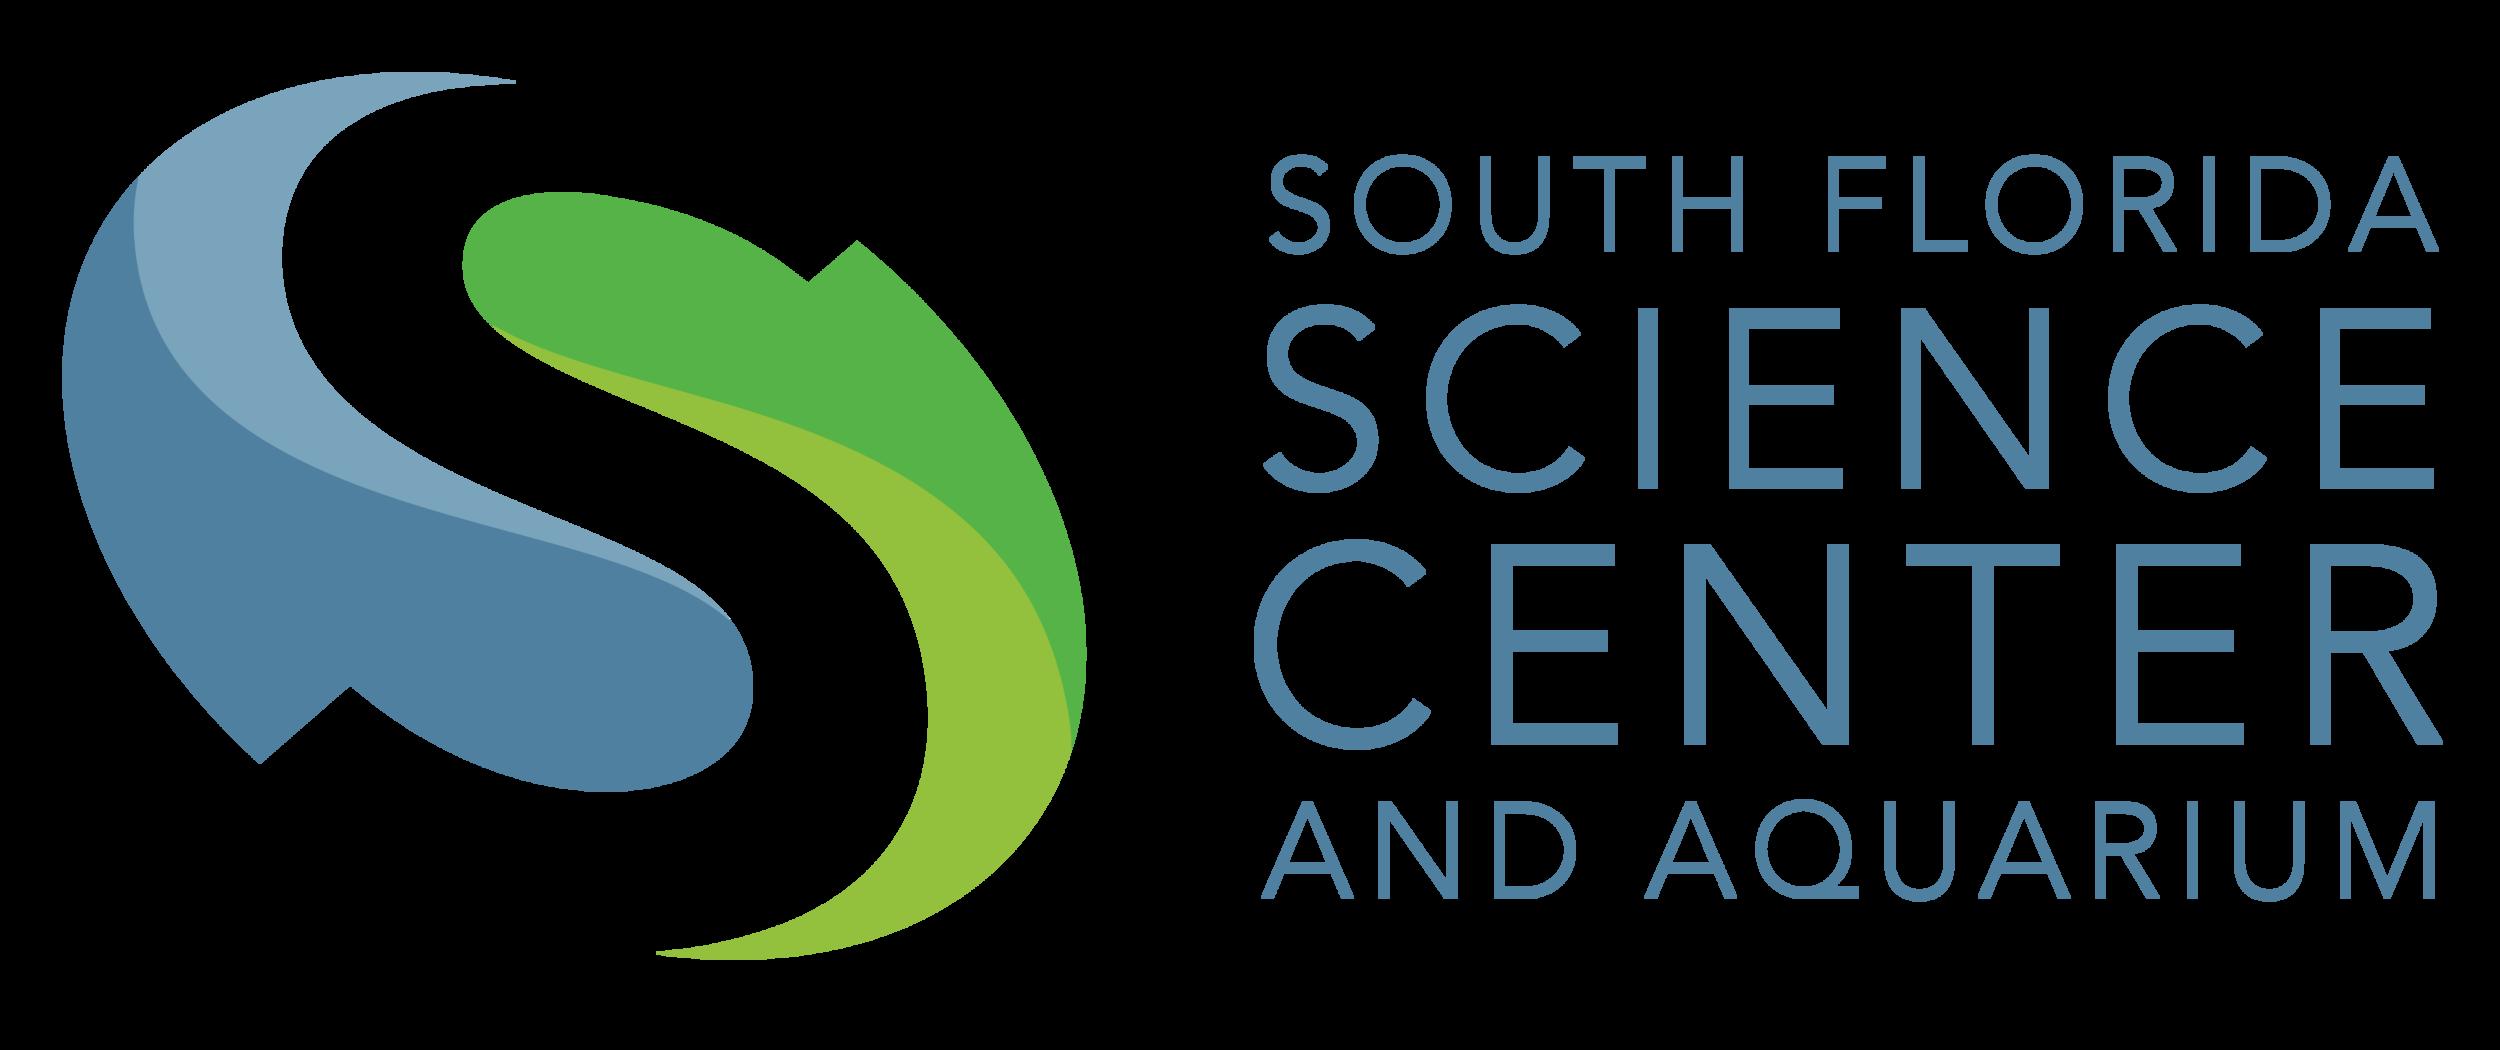 sfsca-logo-hd.png